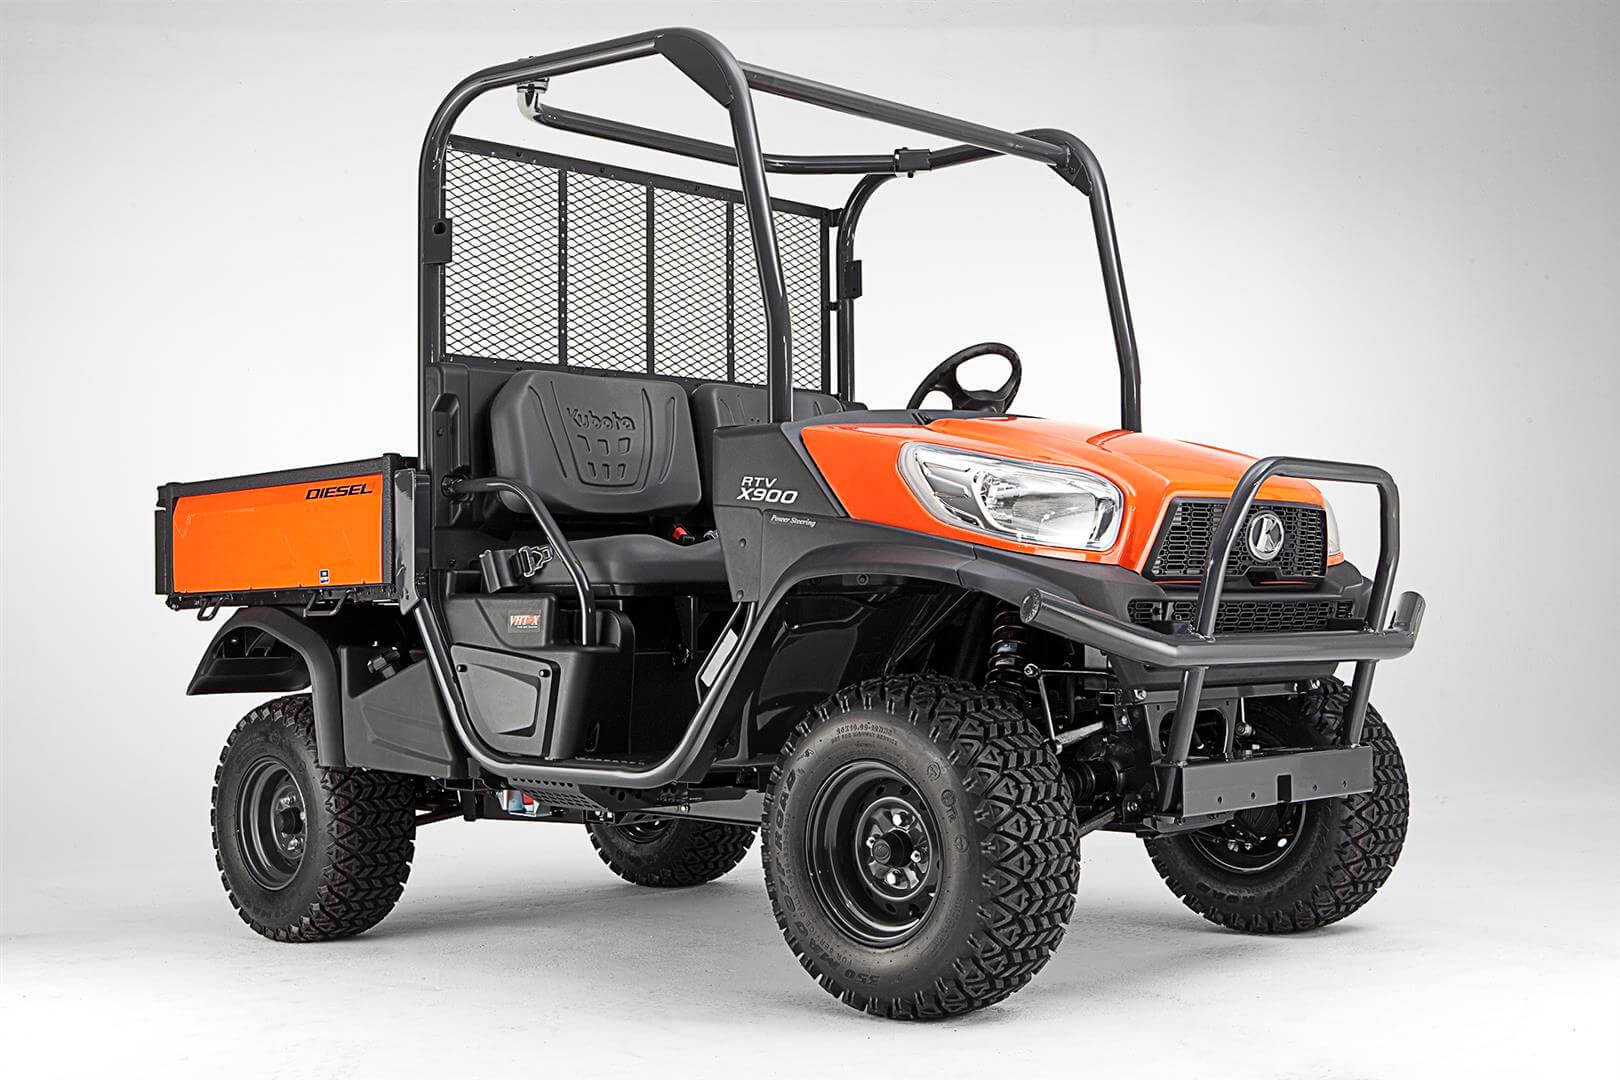 new kubota rtv-x900 worksite orange